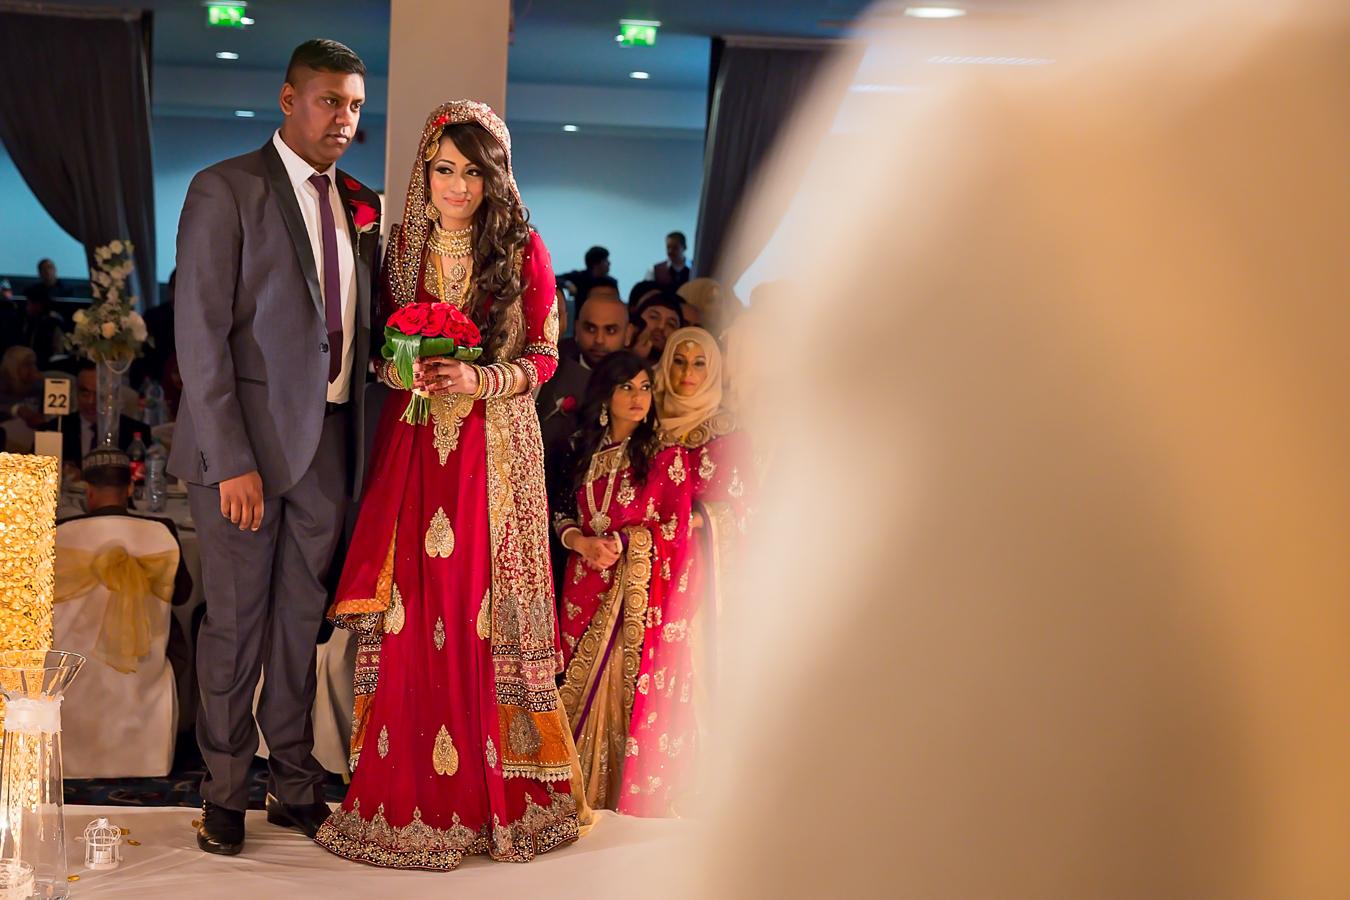 Nasir and Minara wedding at The Sheridan suite Macnchester Didsbury Opu Sultan Photography Manchester and Edinburgh Asian Muslim Hindu Sikh-69.jpg